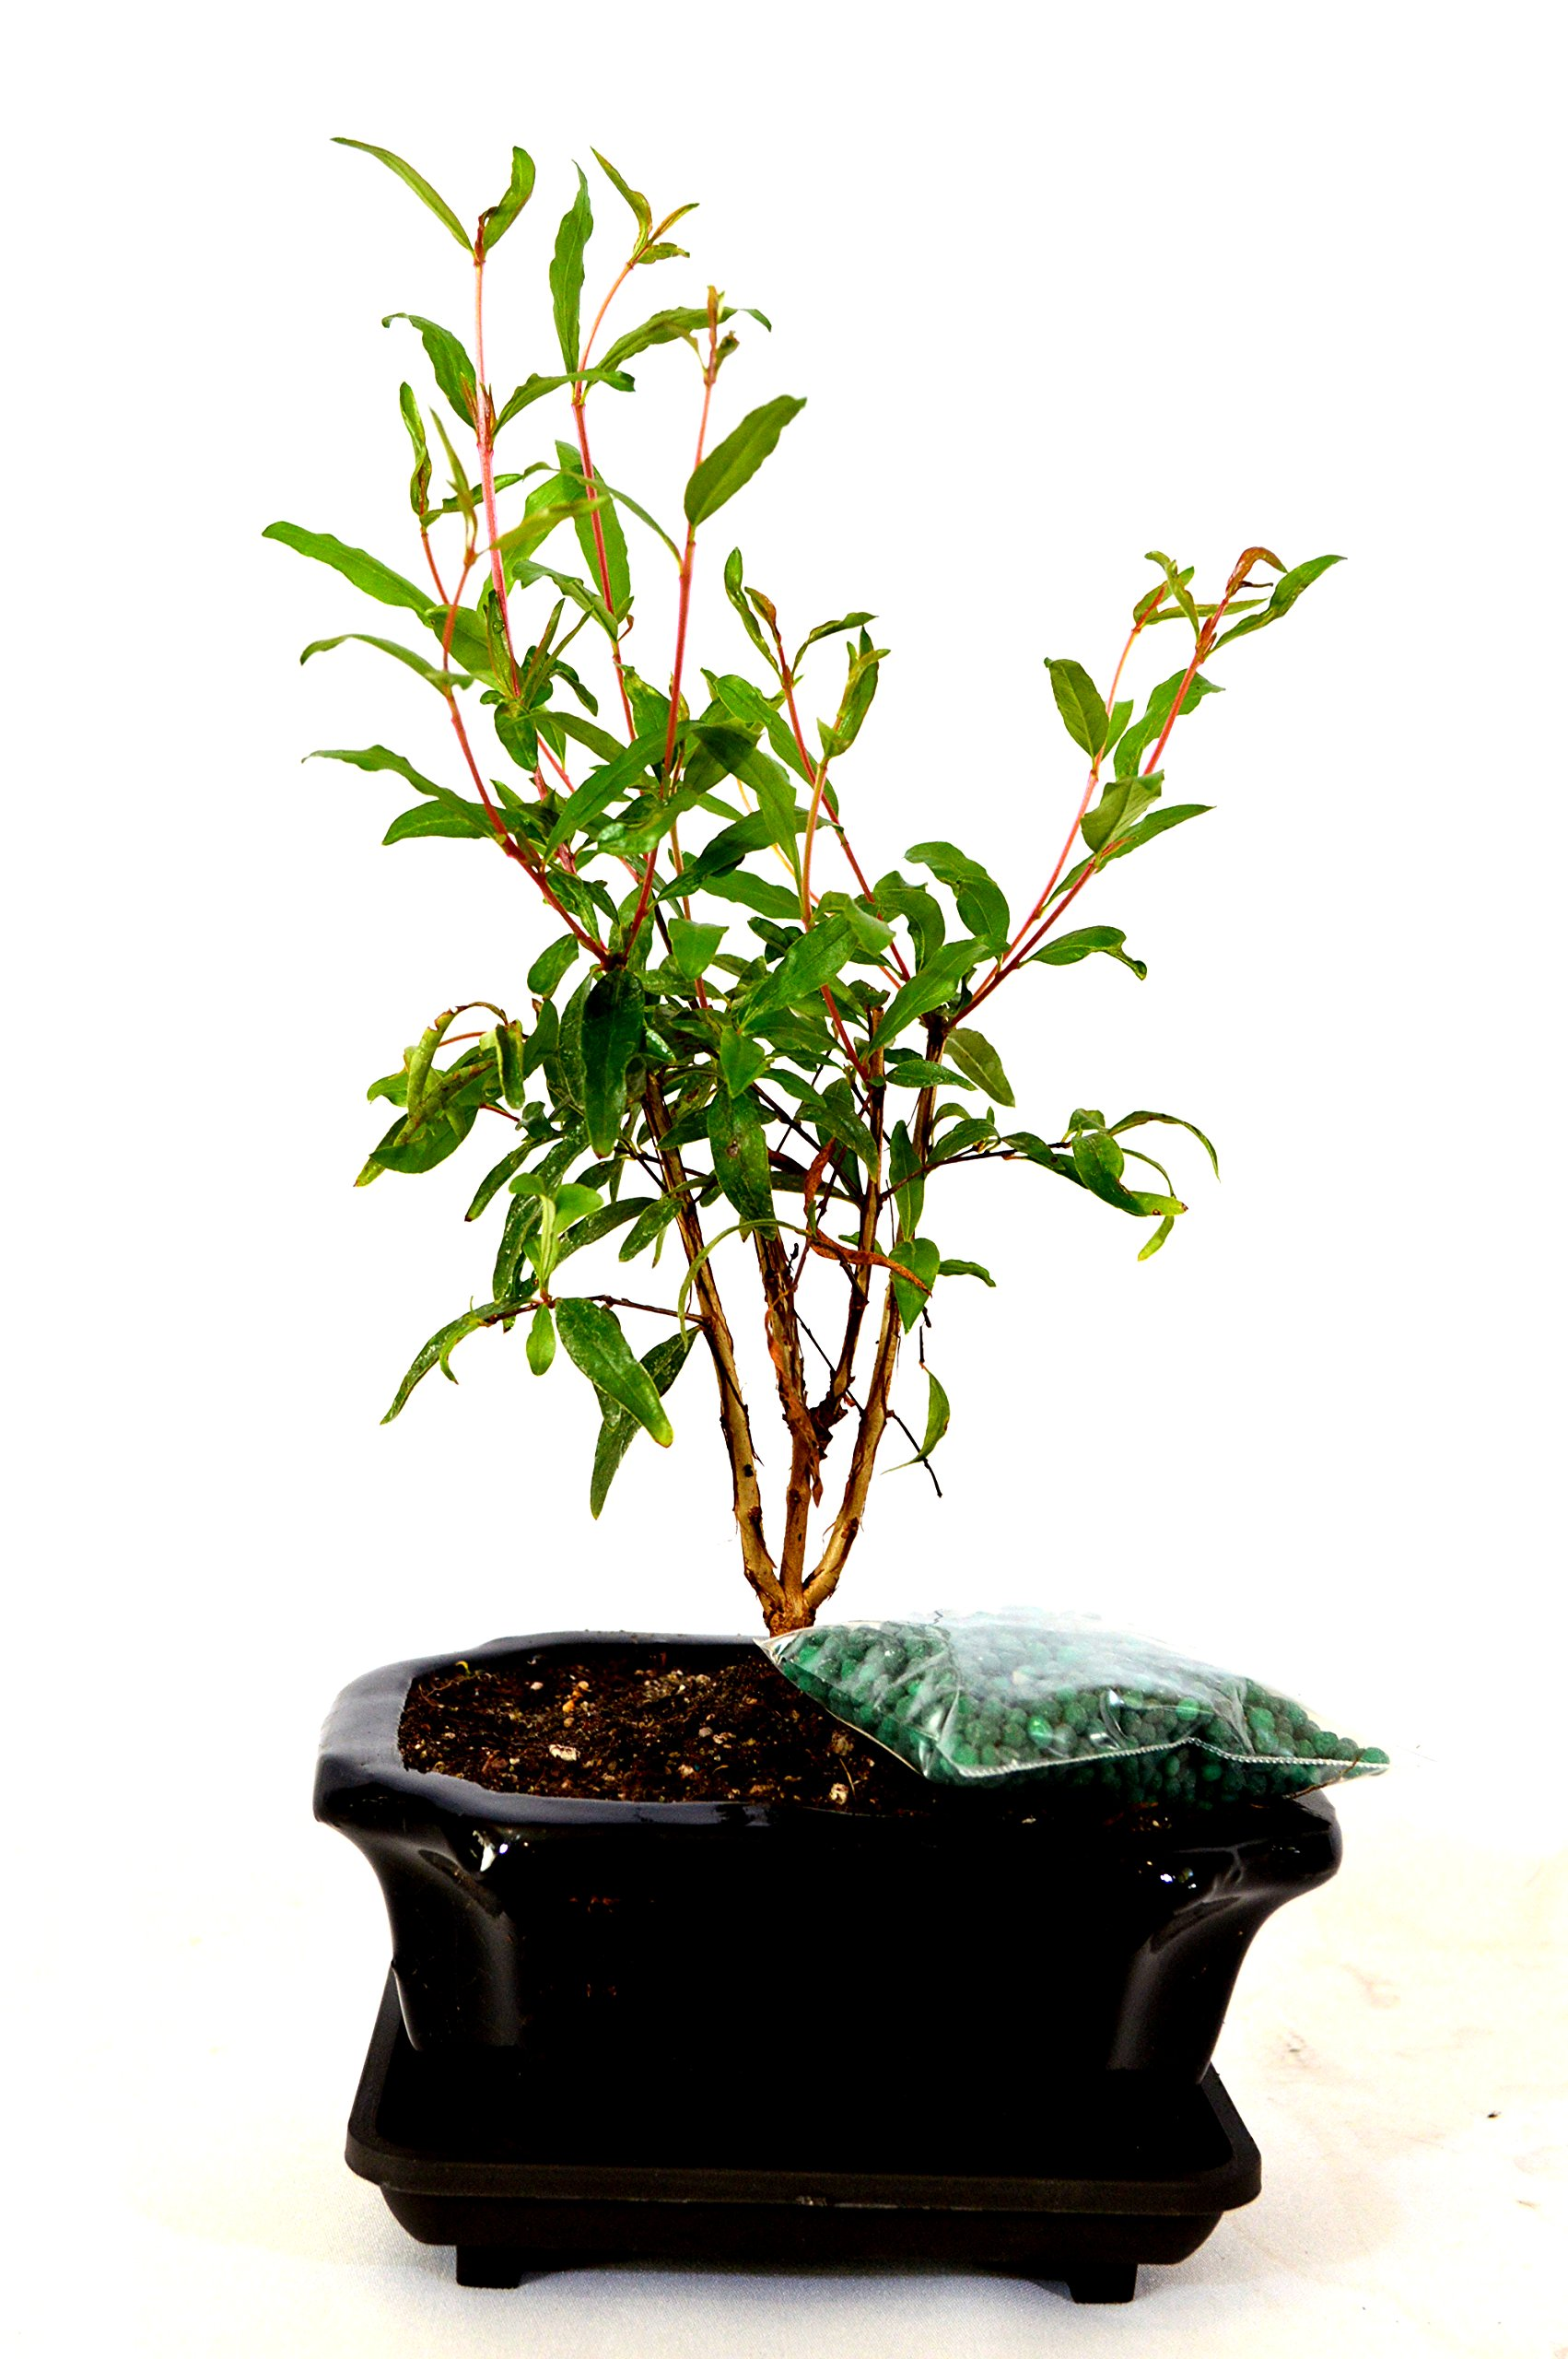 9GreenBox - Dwarf Pomegranate Mame Bonsai with Ceramic Pot by 9GreenBox.com (Image #1)